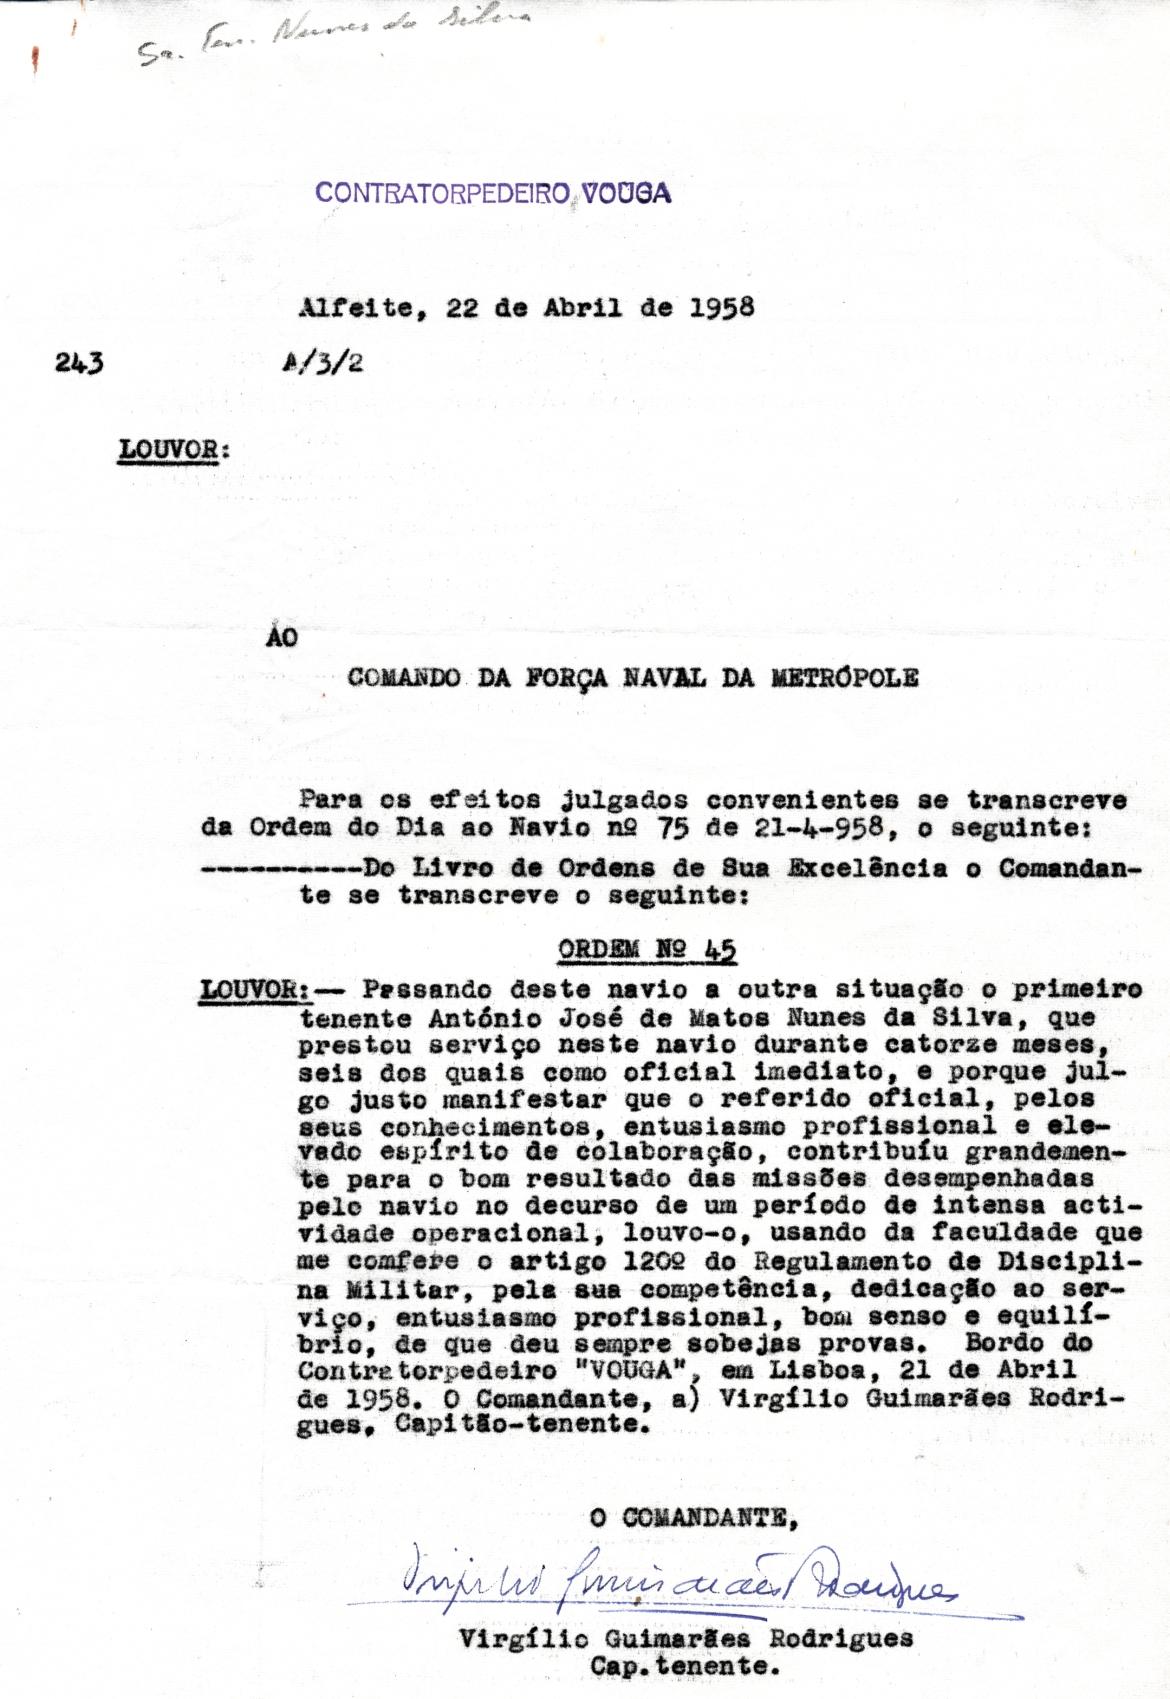 00365 958-04-22 cópia da nota do Vouga comunicando o Louvor concedido a 1º ten Nunes da Silva em 21-4-1958